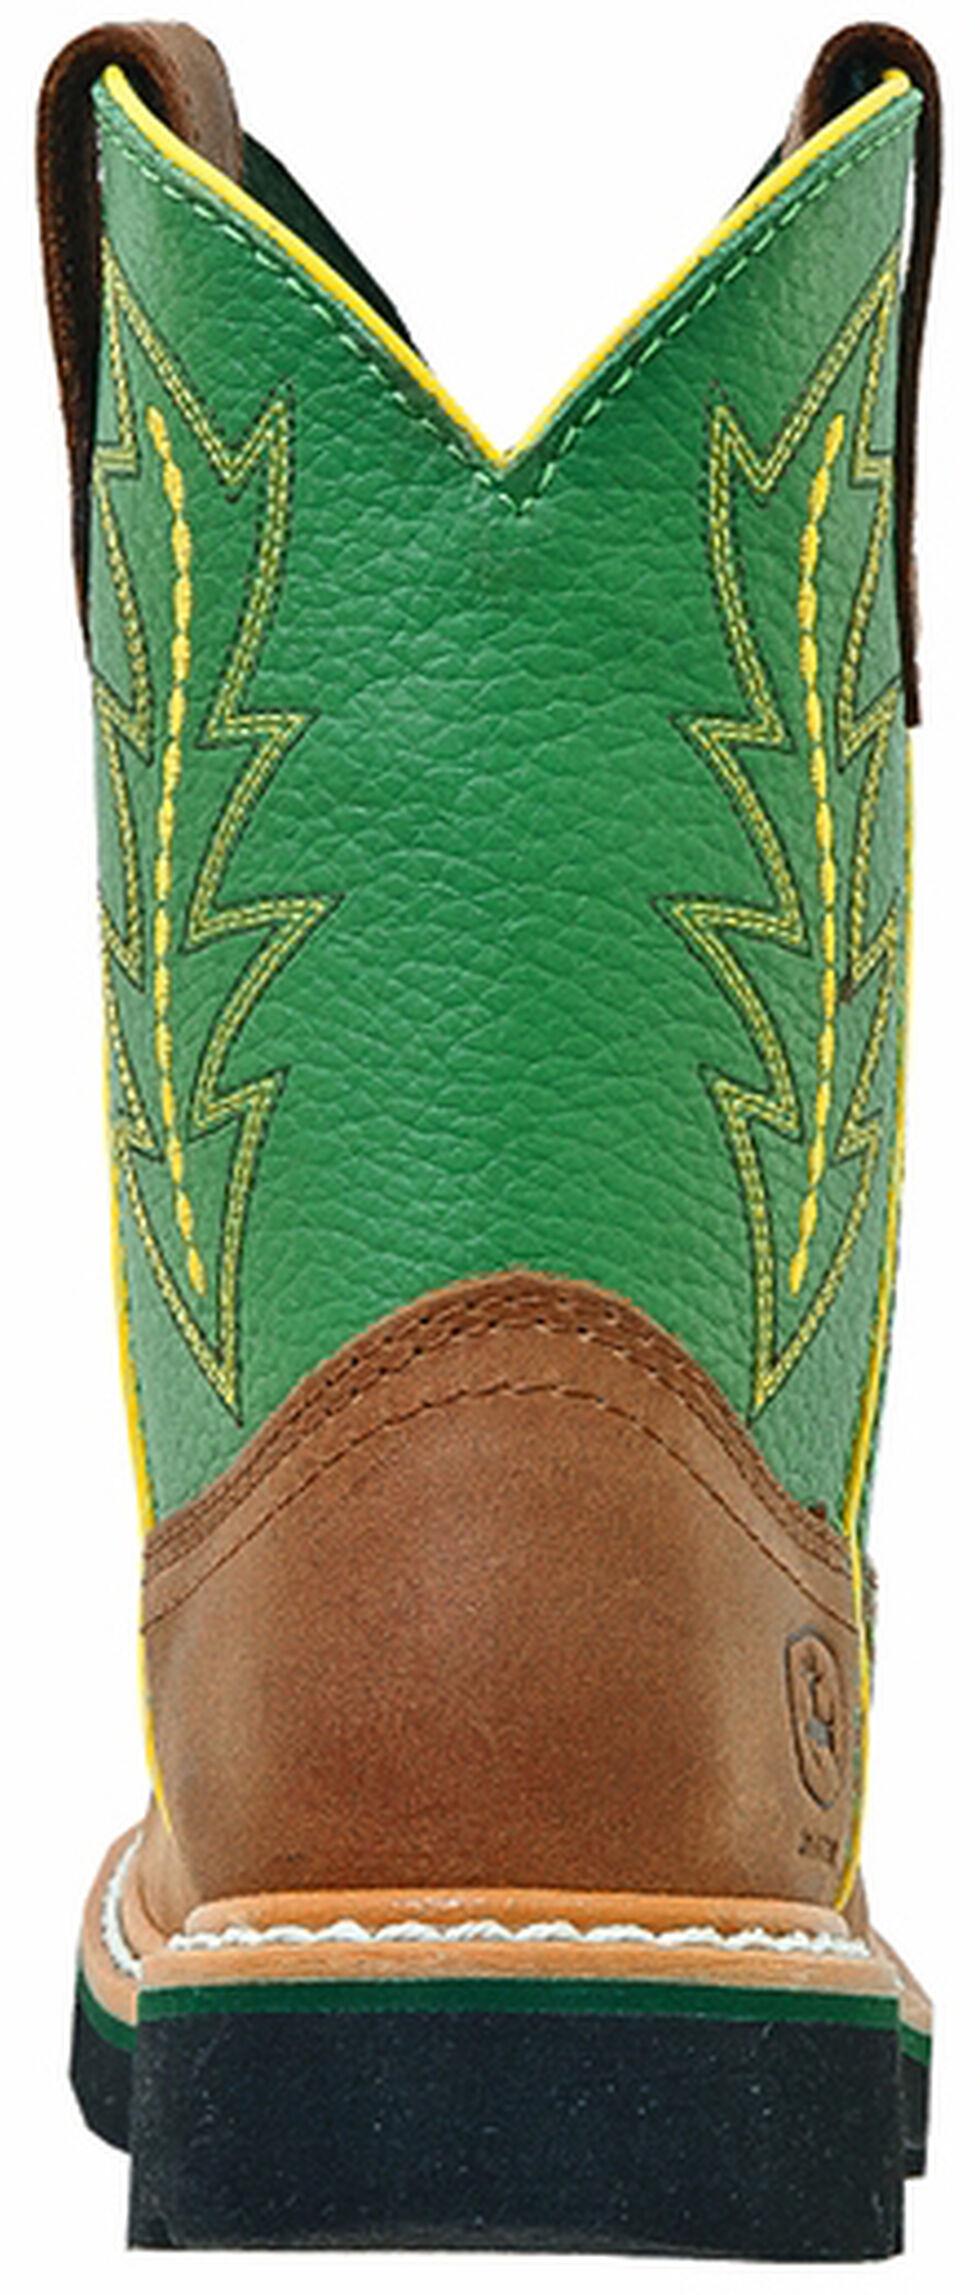 John Deere Youth Boys' Johnny Popper Green Western Boots - Round Toe, Tan, hi-res